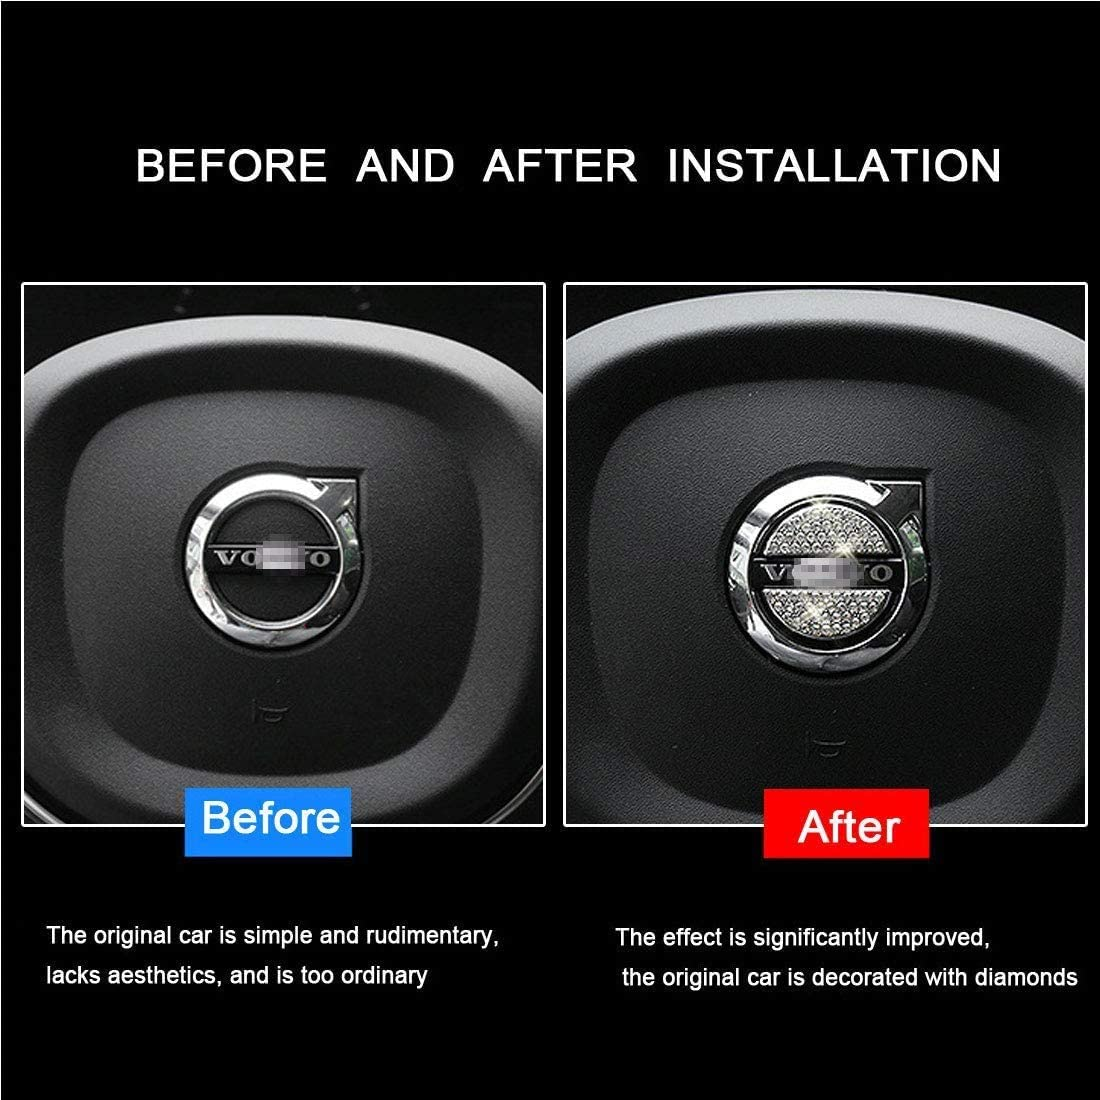 SummerPlus Car Steering Wheel Decorative Diamond Crystal Decal Decoration Cover Sticker Compatible with Mercedes Benz Compatible with Mercedes Benz 45mm